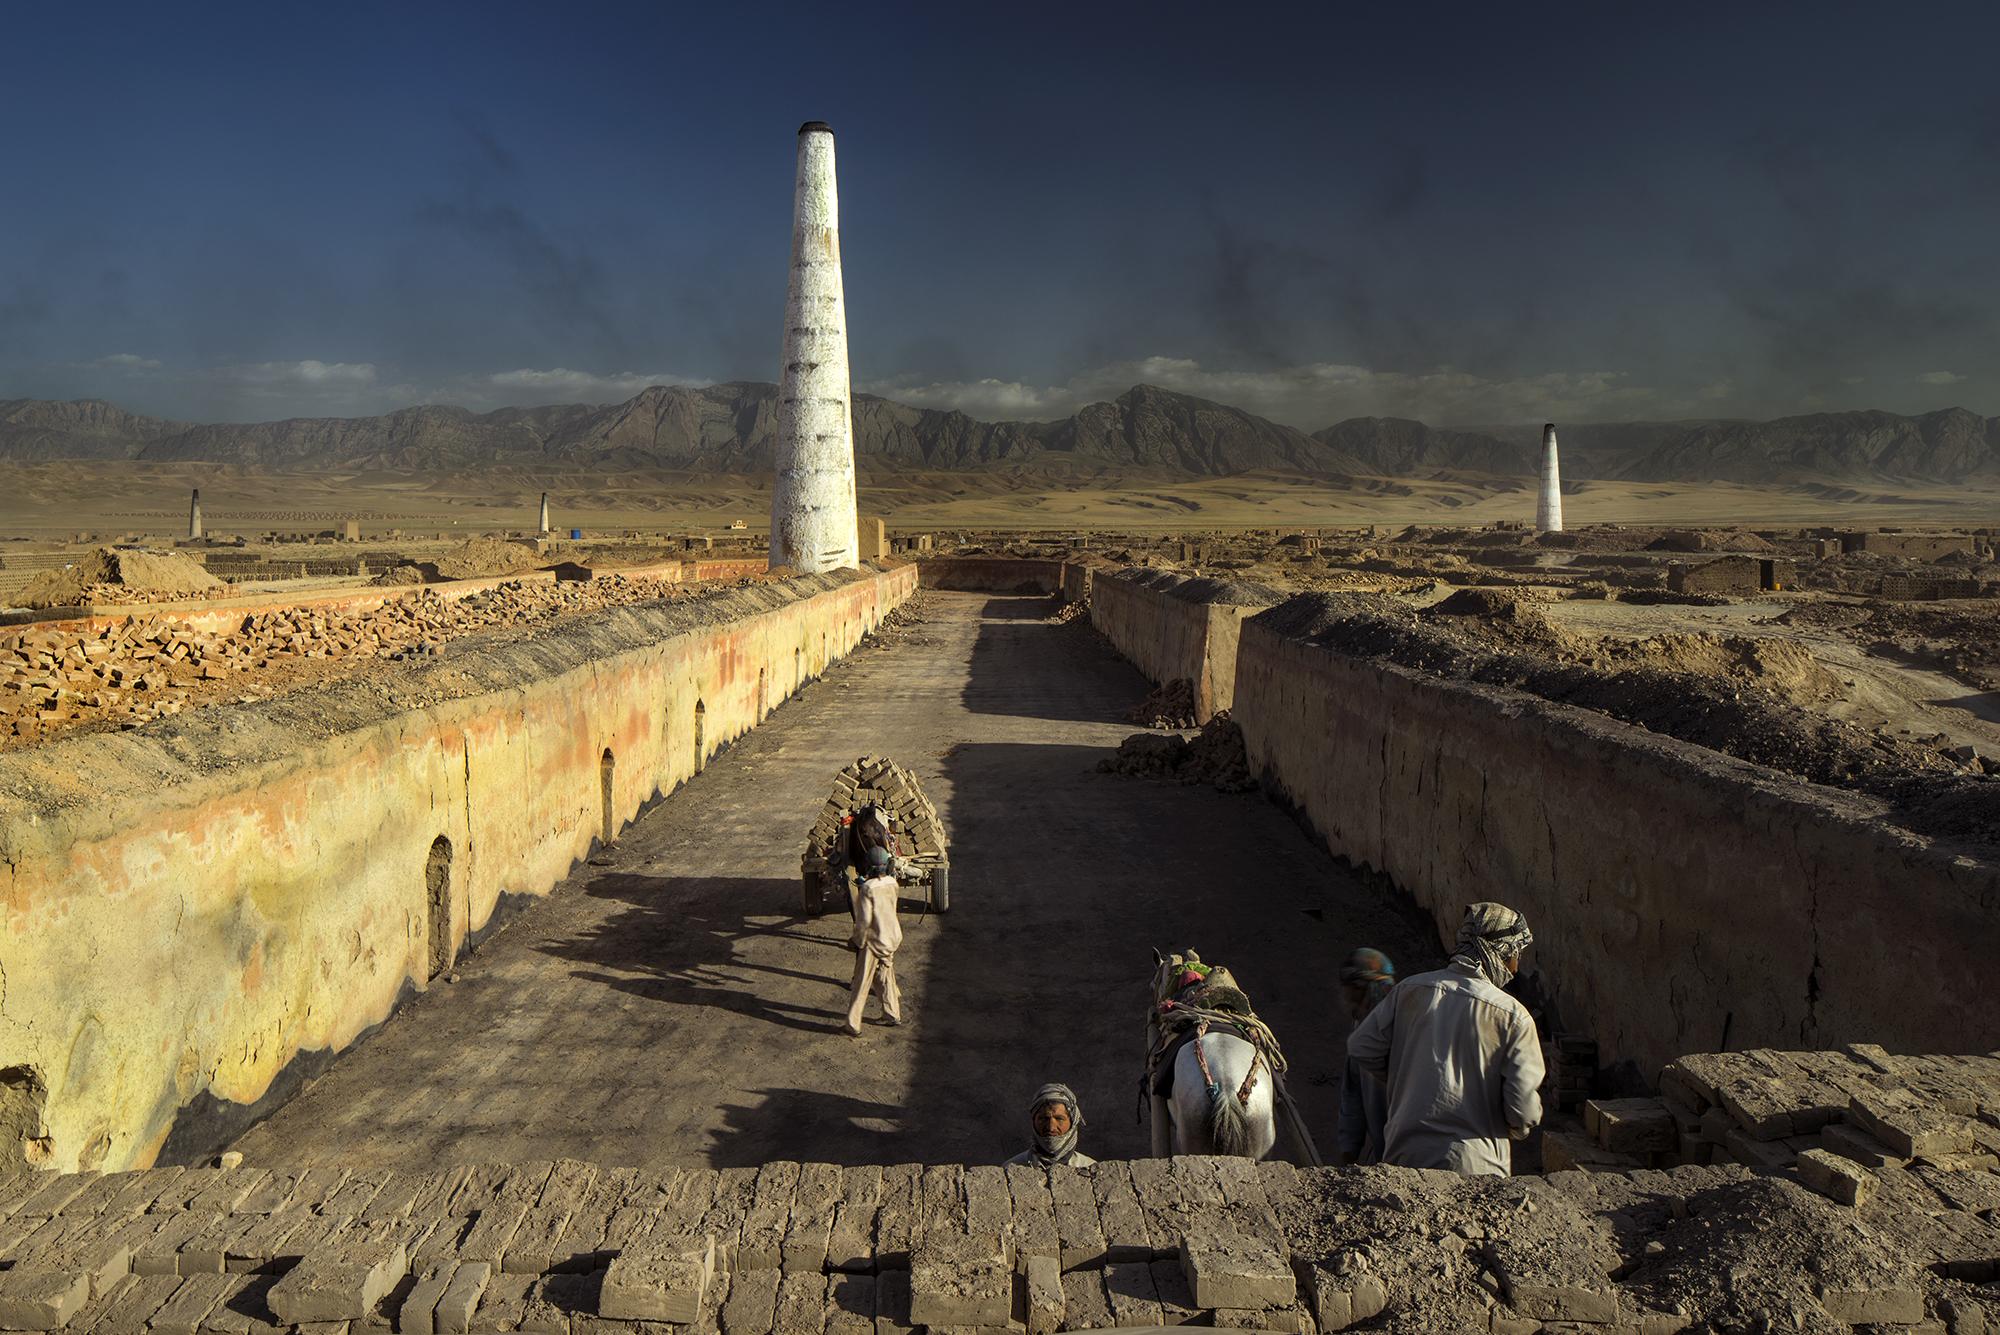 Road to Kunduz, near Mazar-e-Sharif, Afghanistan